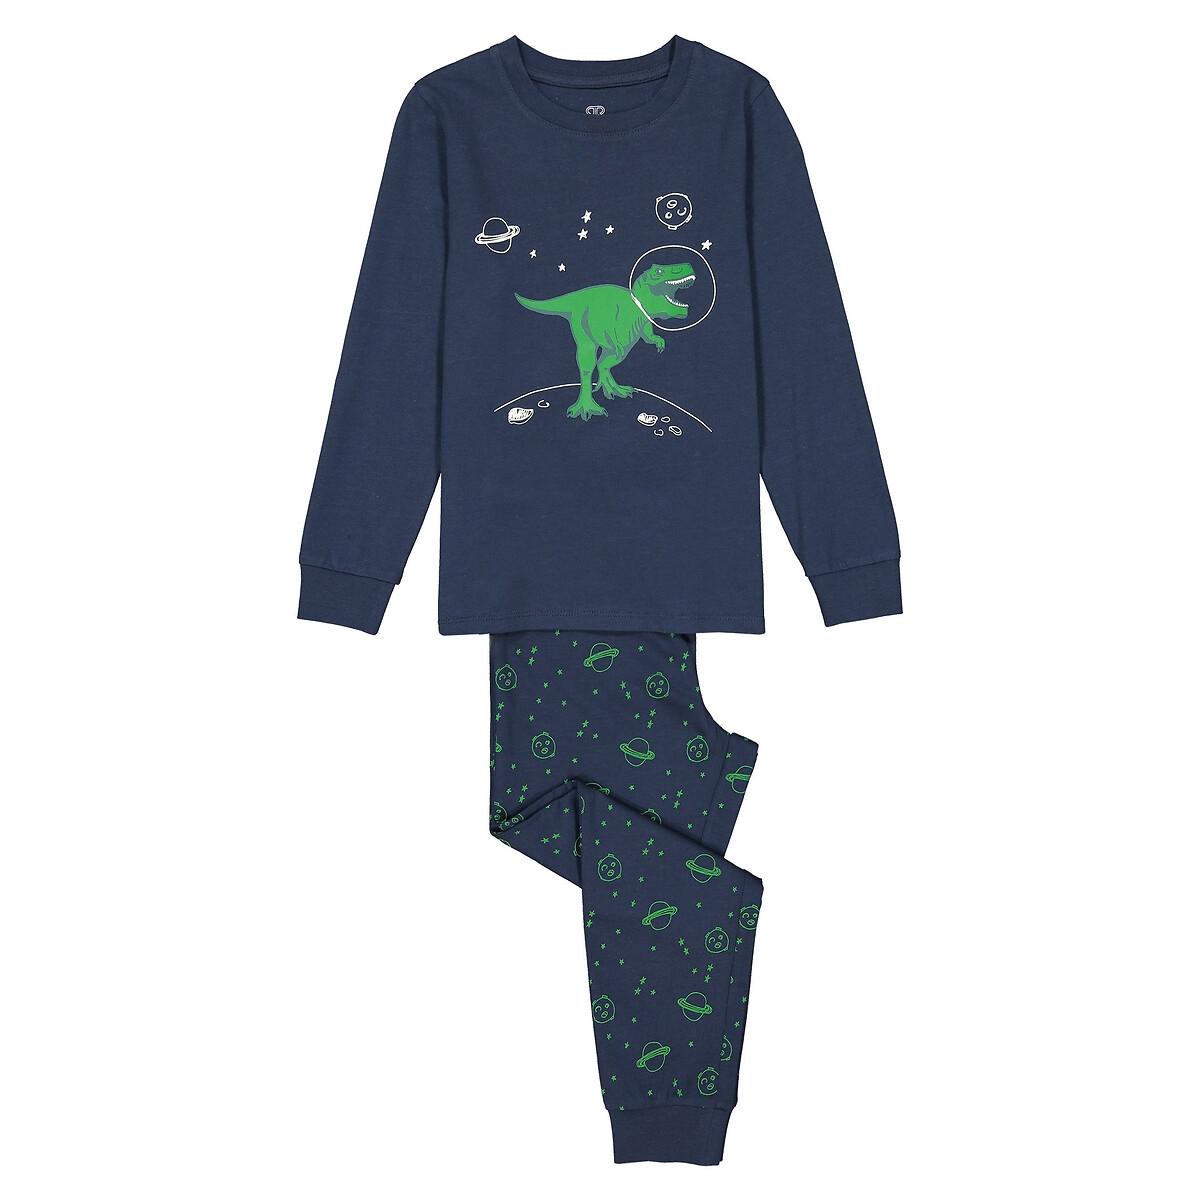 Фото - Пижама LaRedoute С фосфоресцирующим рисунком из джерси 3-12 лет 8 лет - 126 см синий рубашка laredoute джинсовая 3 12 лет 8 лет 126 см синий